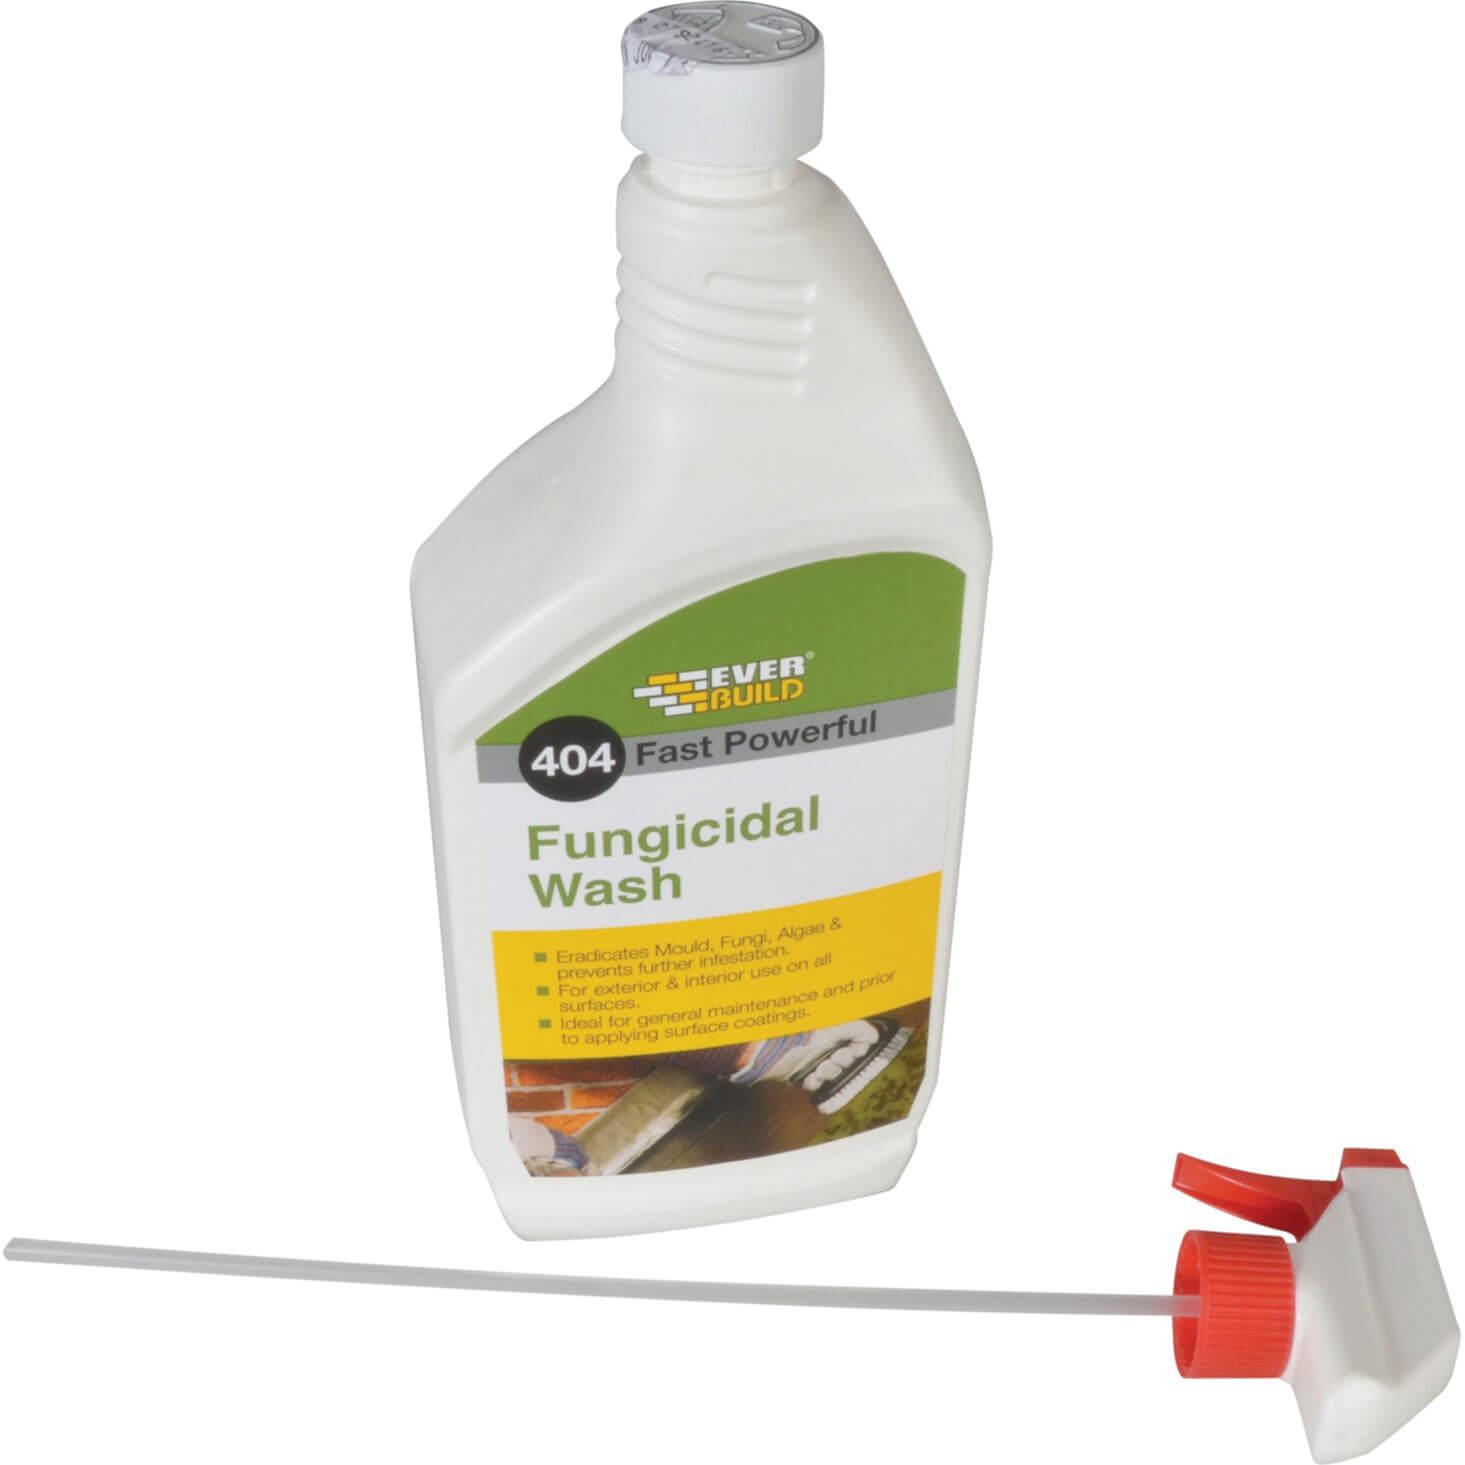 Image of Everbuild Fungicidal Wash 1L